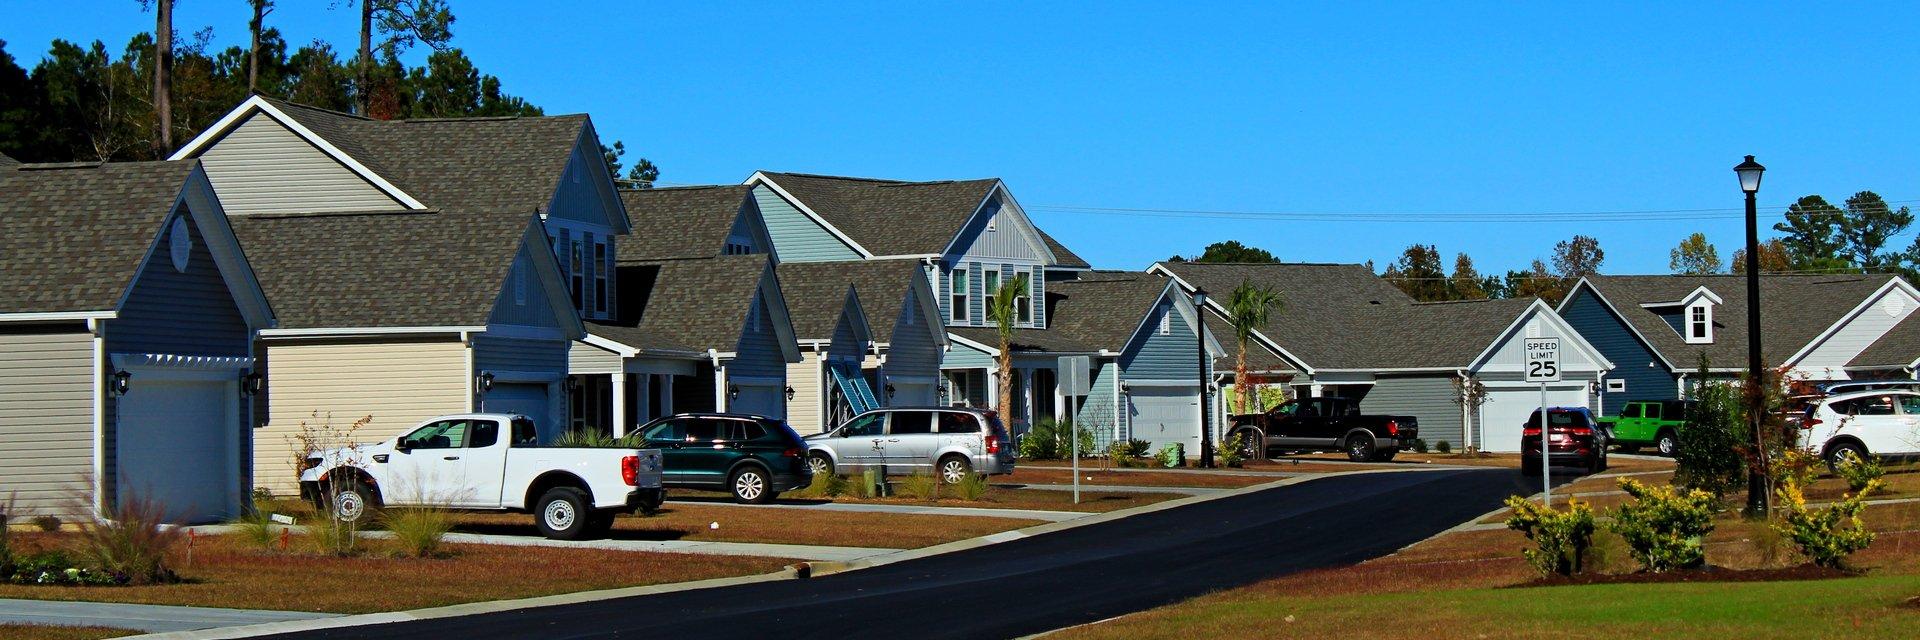 Homes For Sale in Surfside Plantation Surfside Beach SC